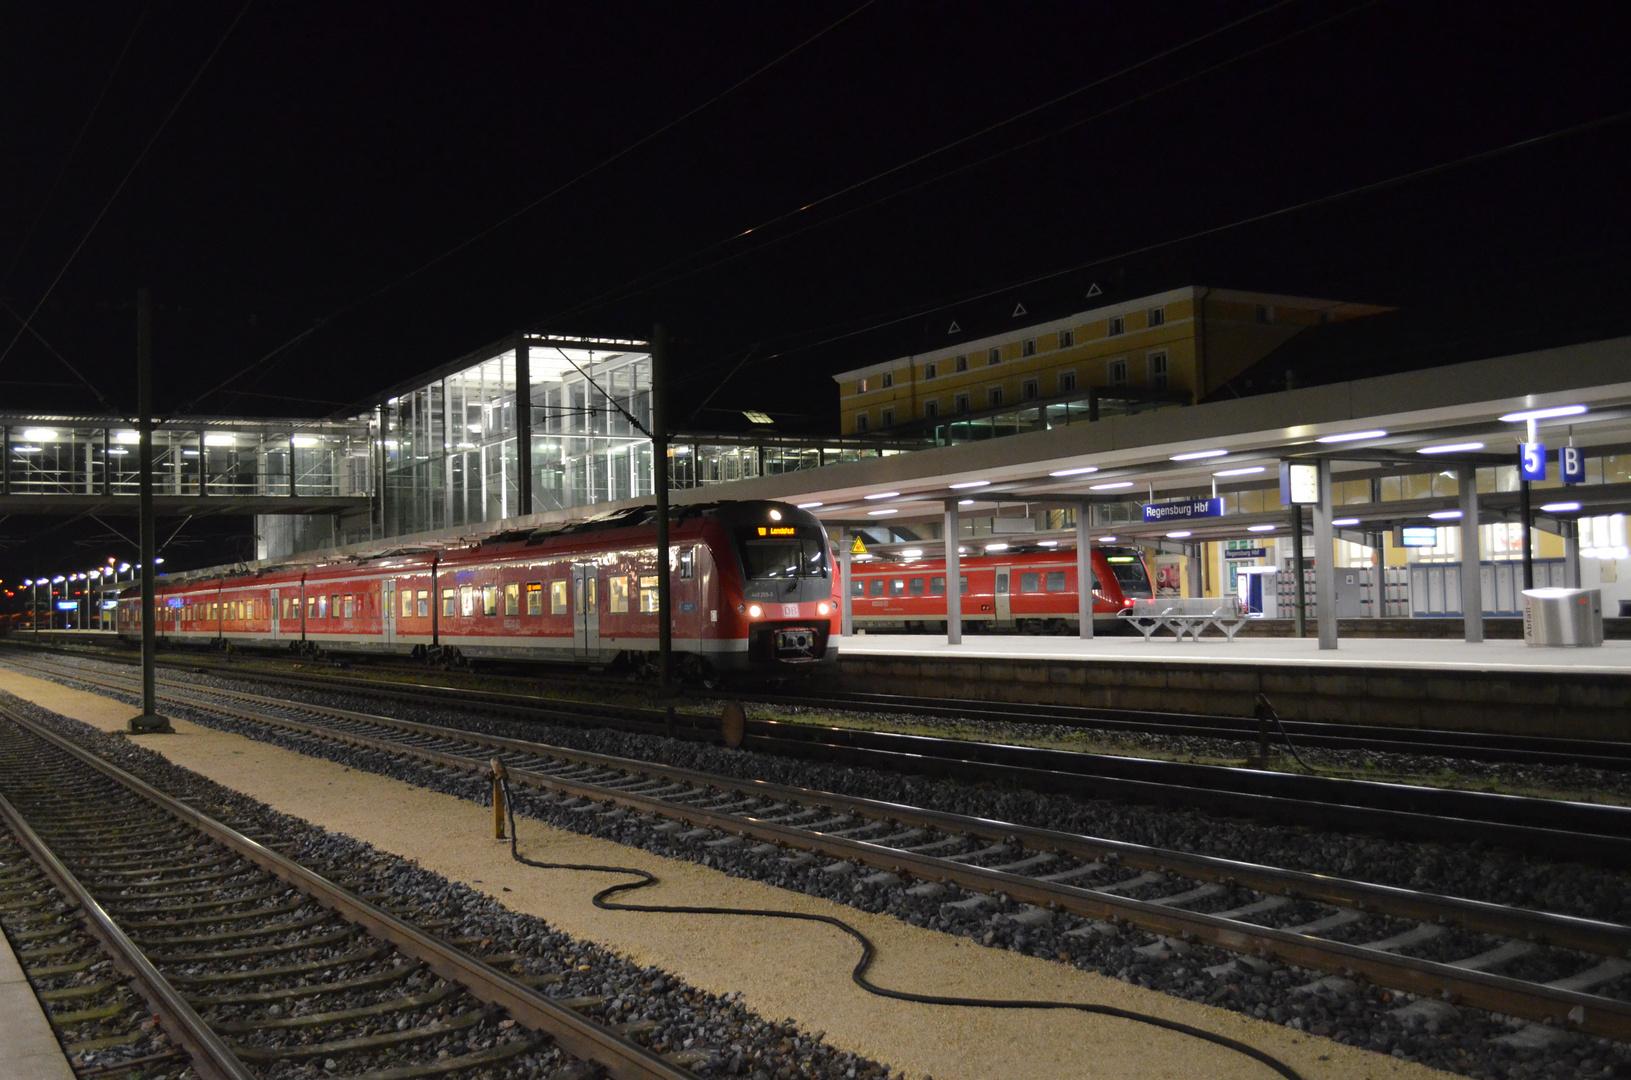 Baureihe 440 in Regensburg HBF